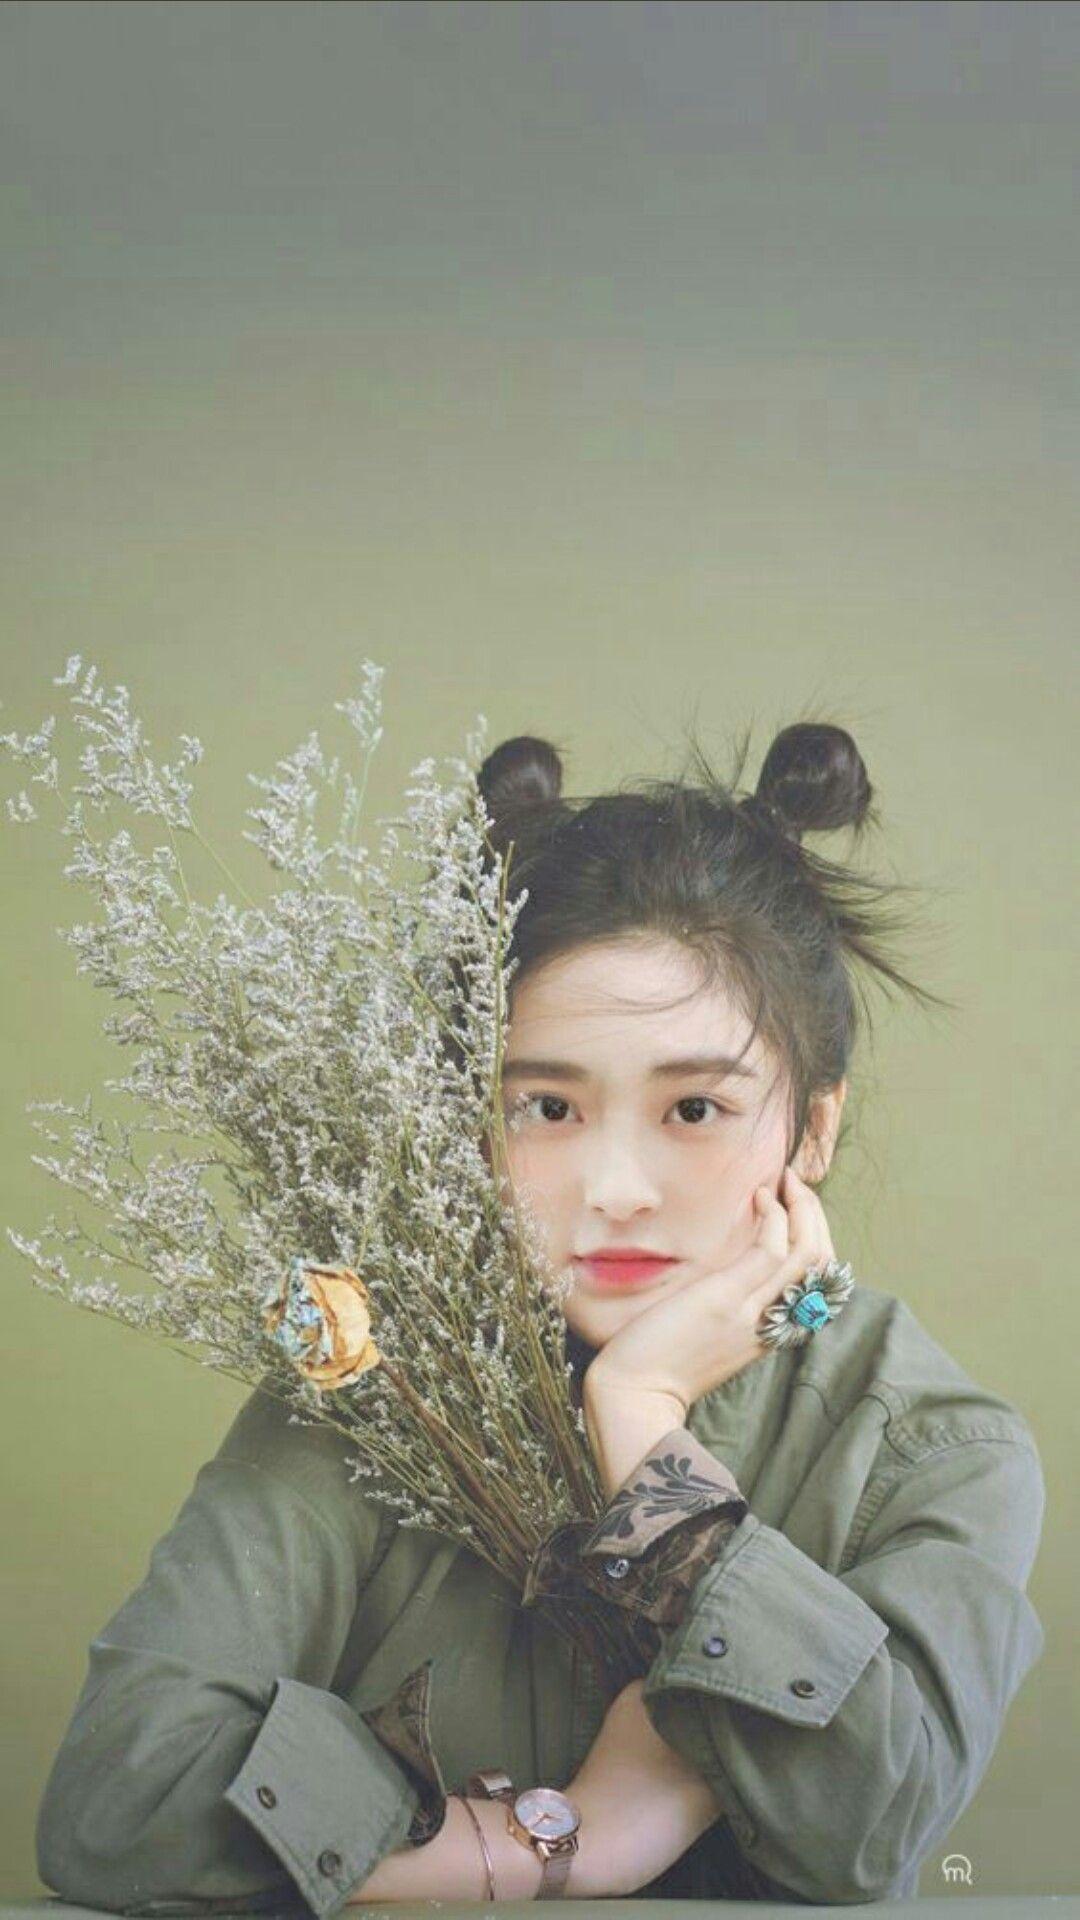 Pin by 🌸 Jae 🌸 on Meteor Garden 2018 流星花园2018 in 2020